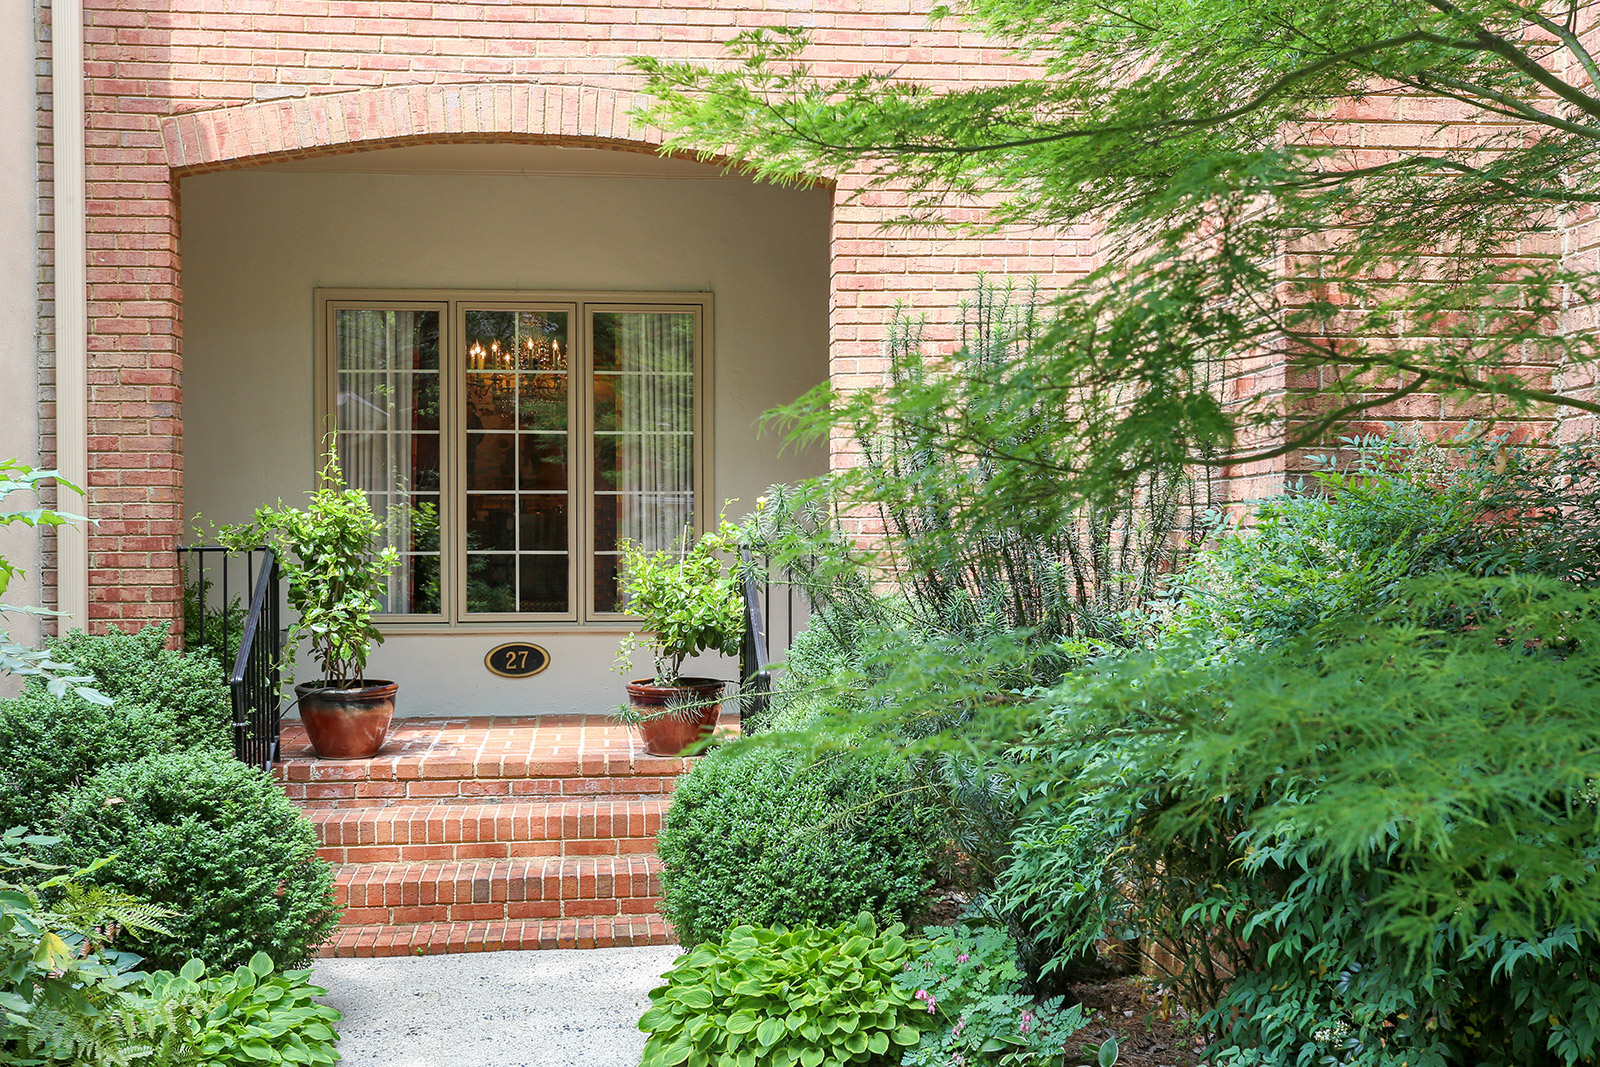 Nhà chung cư vì Bán tại Sophisticated Townhome For The Distinguished Buyer 27 Paces West Drive Atlanta, Georgia, 30327 Hoa Kỳ